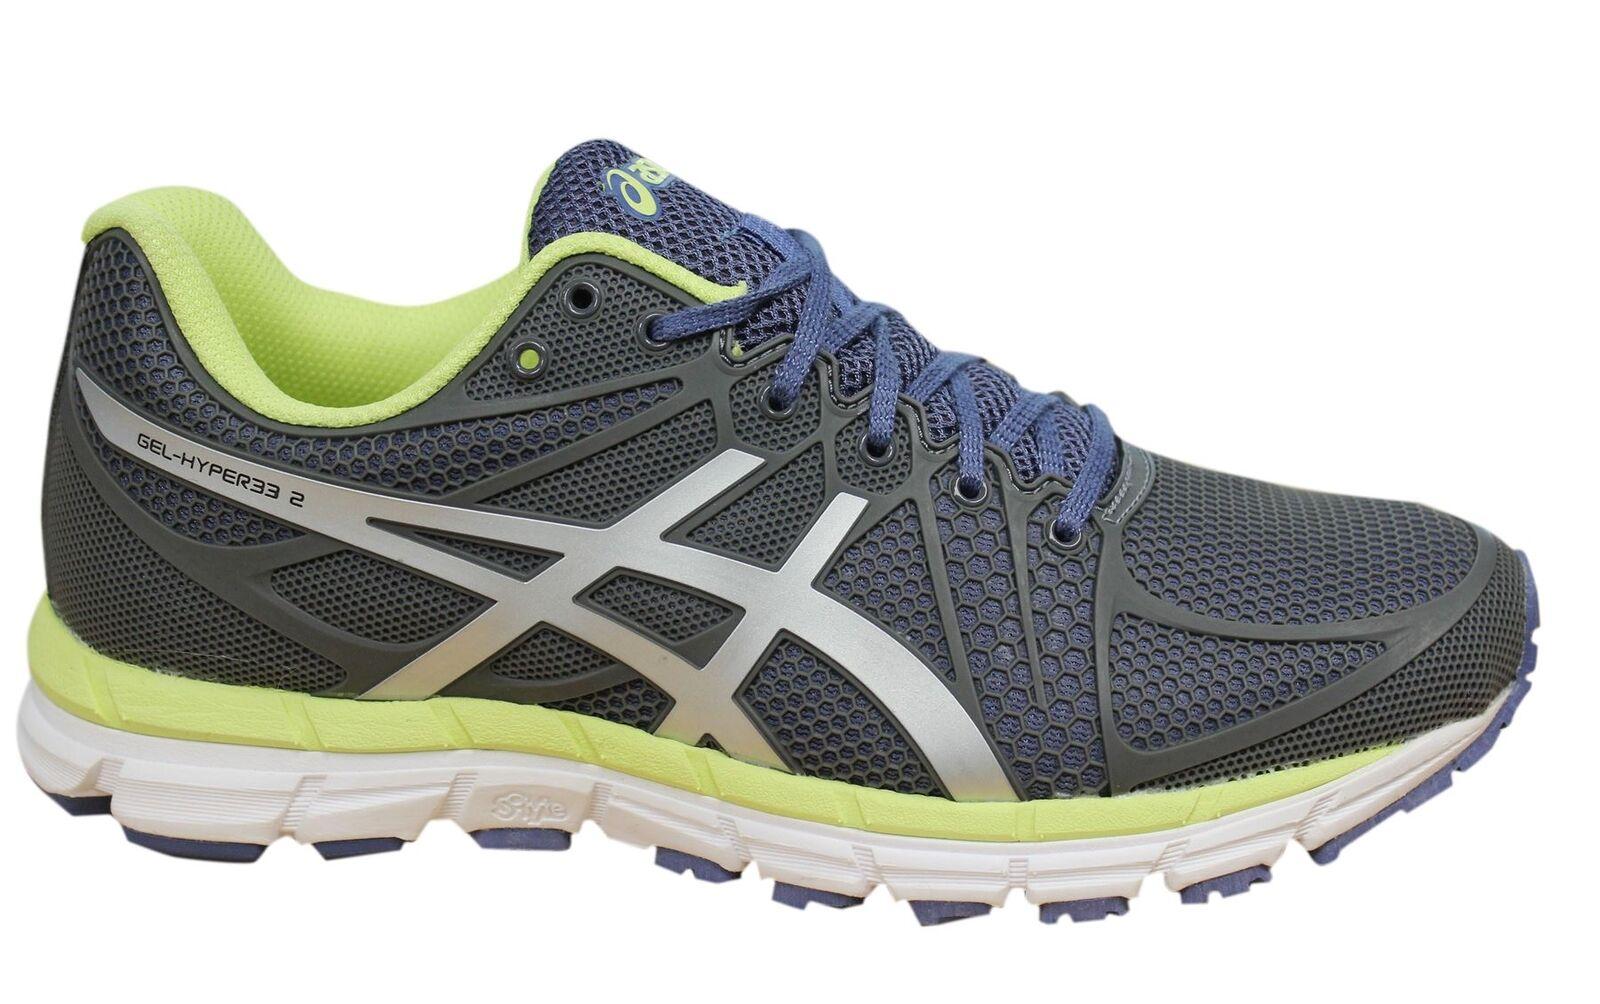 Asics Gel-Hyper33 2 Lace Up grau Synthetic damen Trainers T368N 7991 D10  | Moderne Technologie